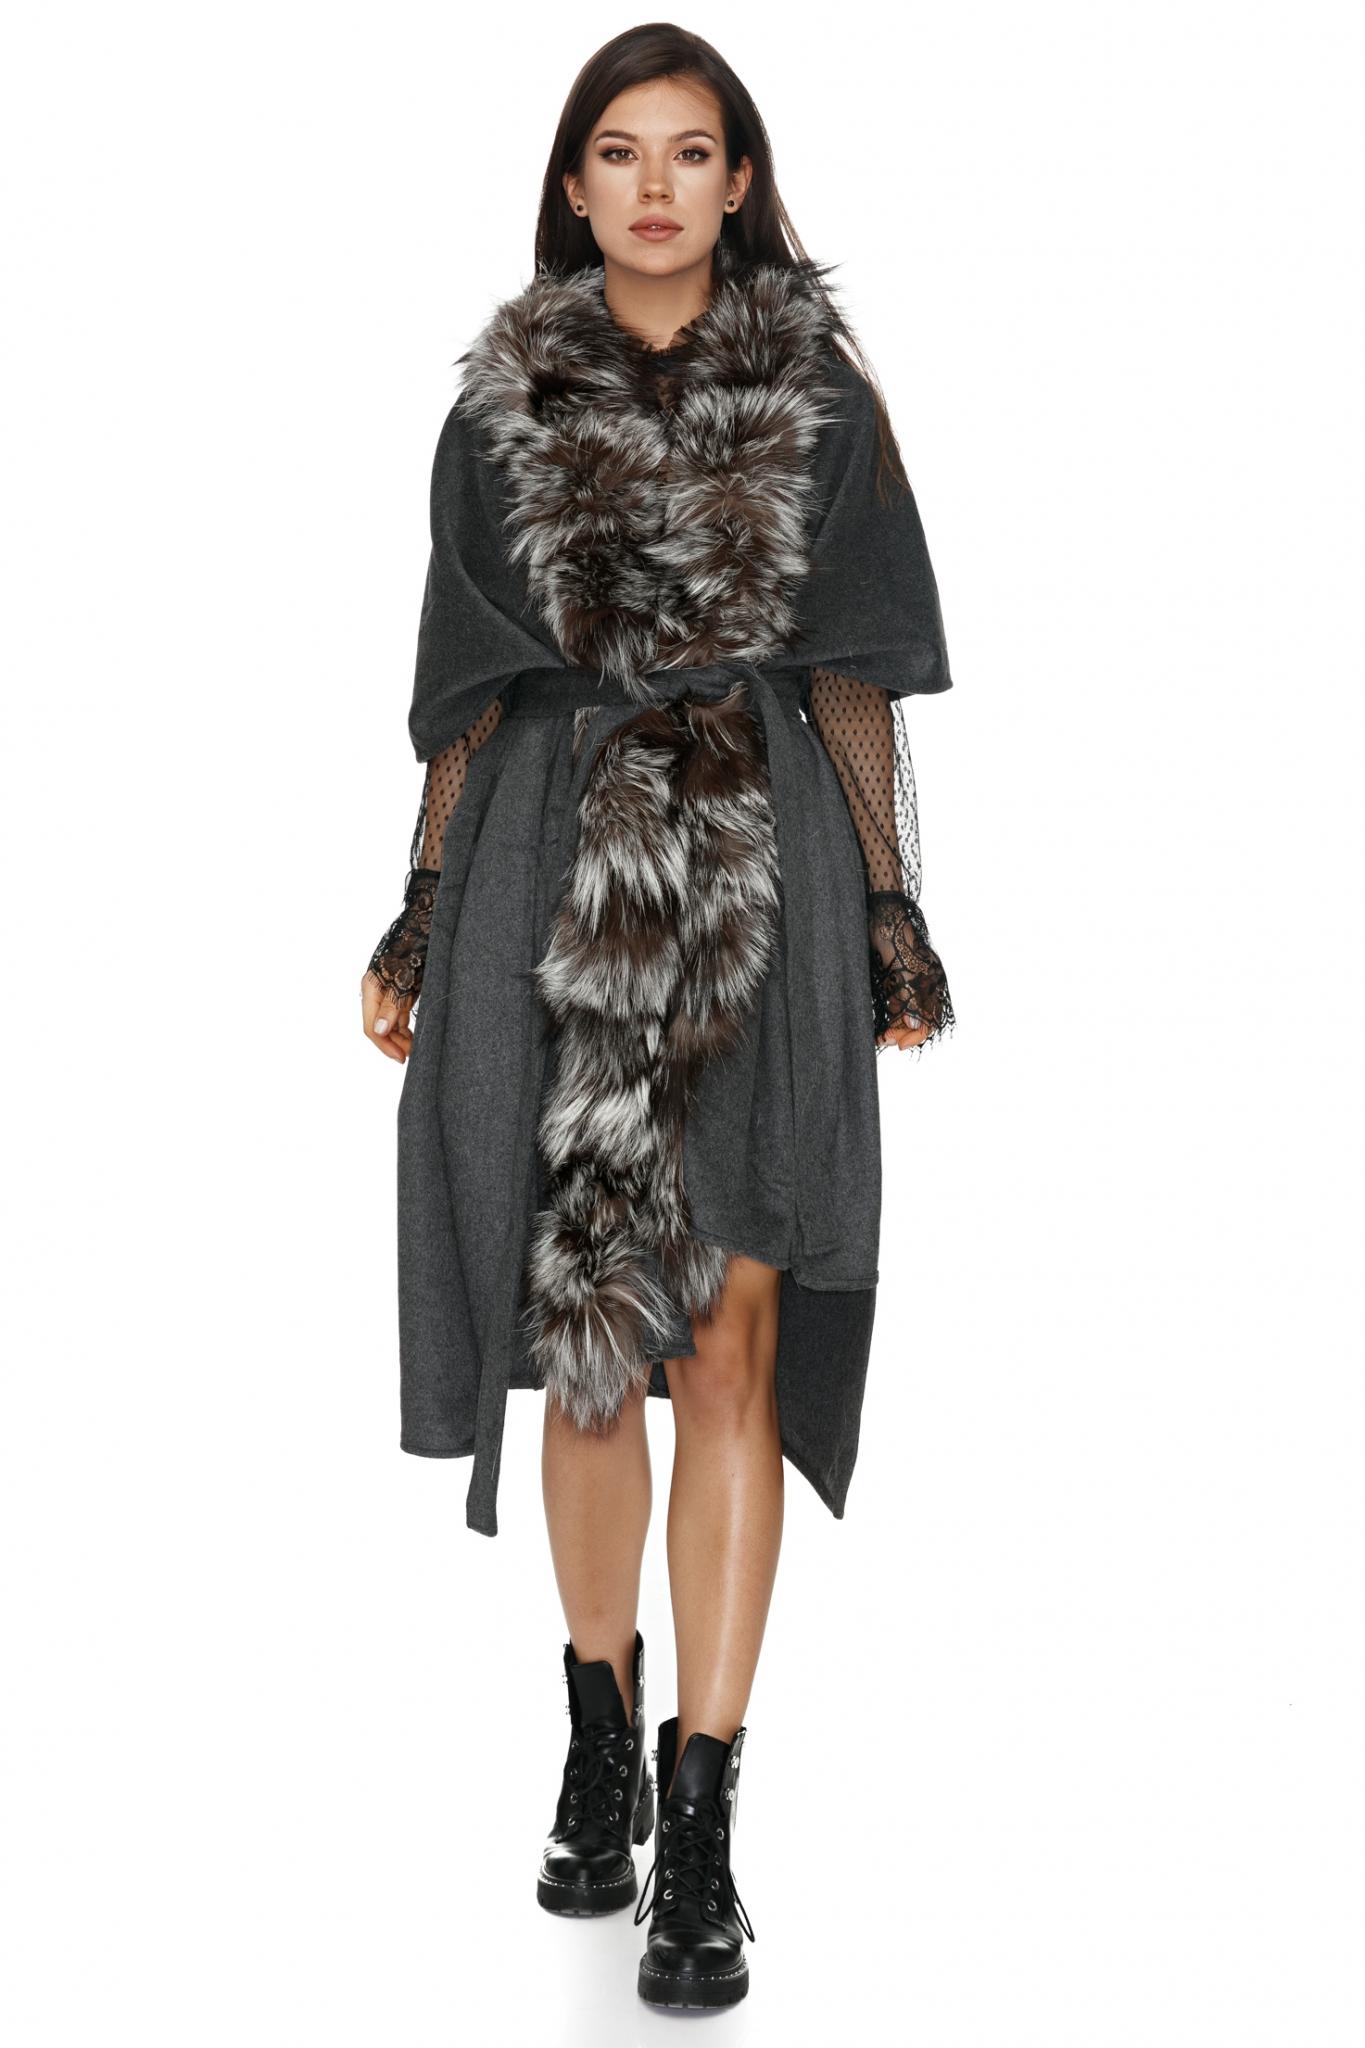 milano-style-grey-coat-with-fox-fur-ebele